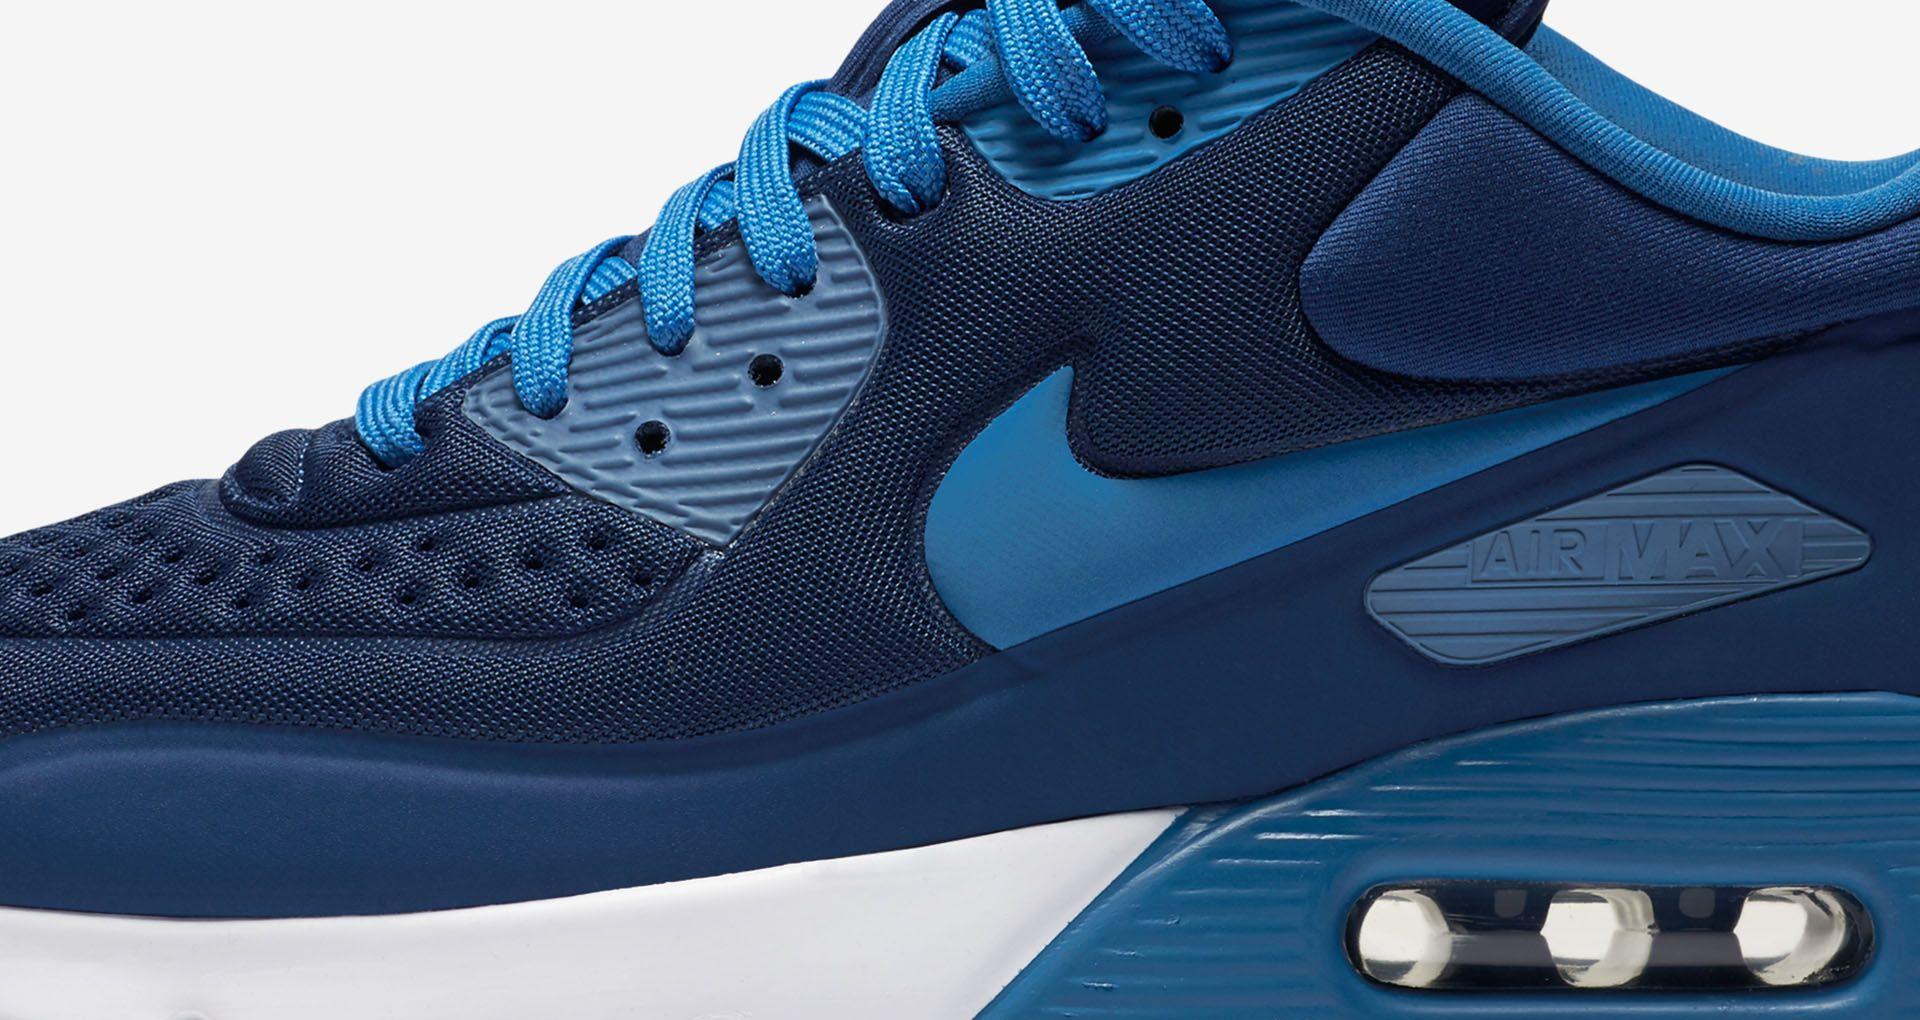 Nike Air Max 90 Ultra SE 'Ice Blue'. NikePlus SNKRS